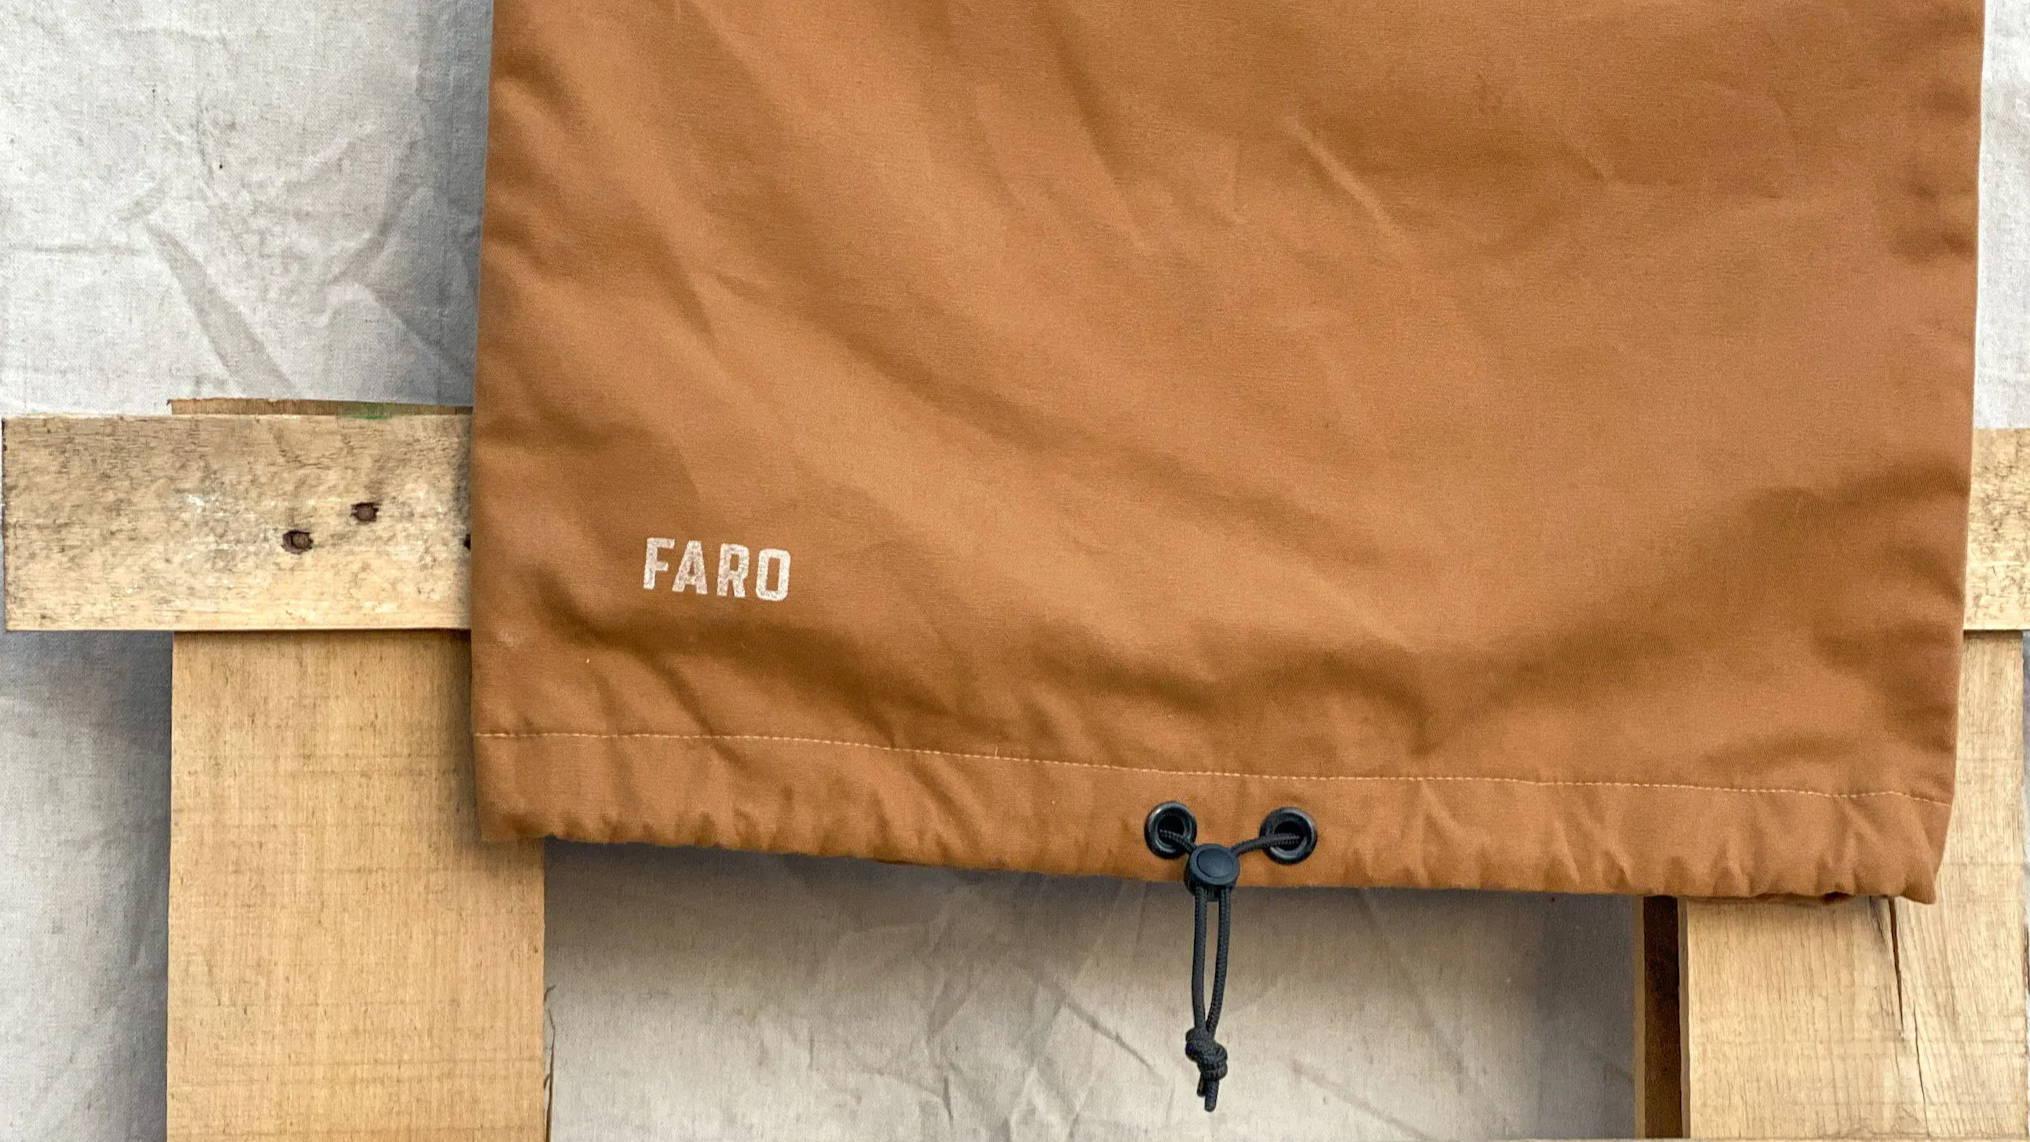 brown surfboard bag hanging